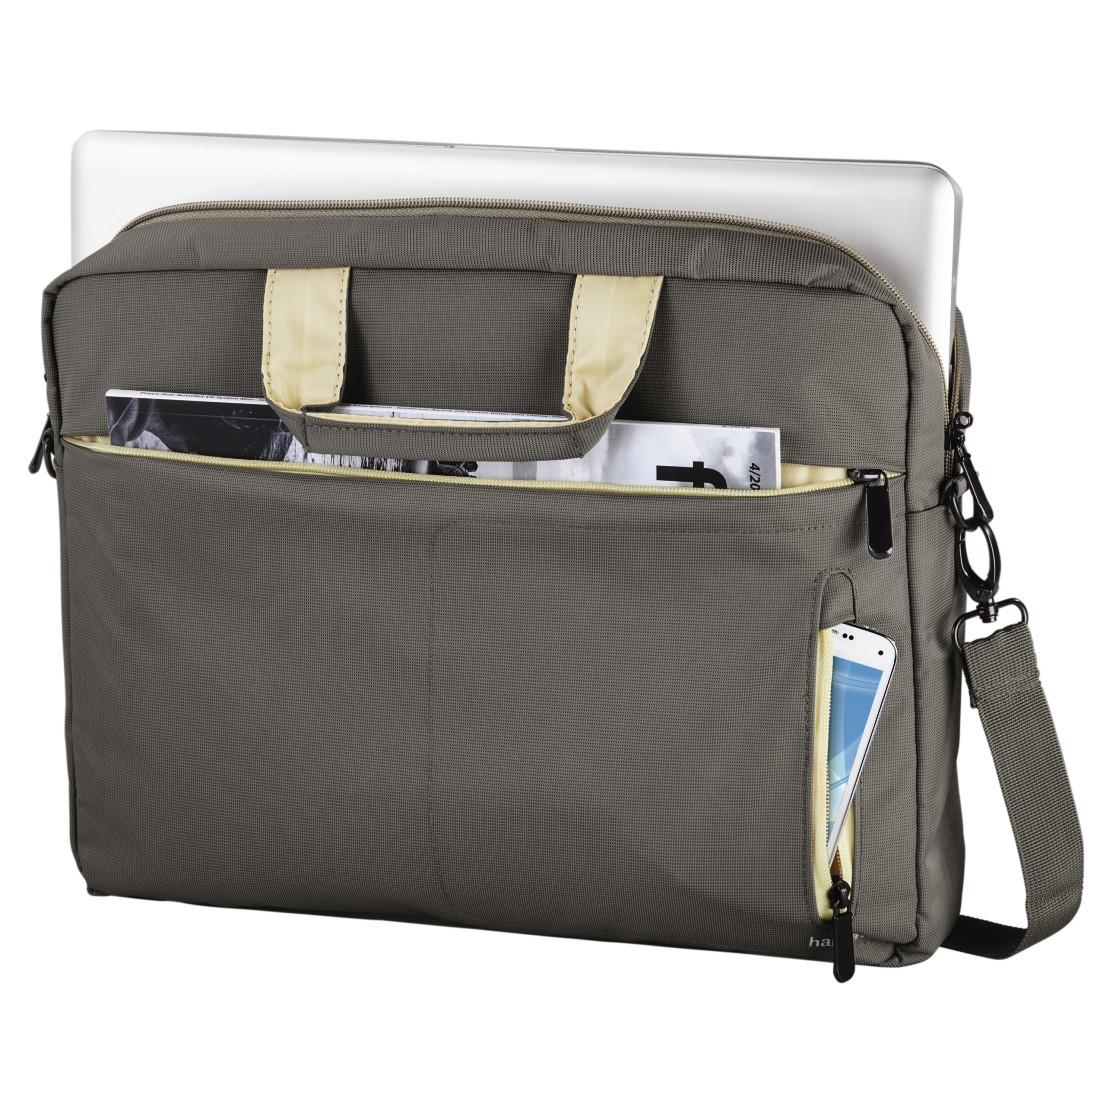 "Чанта за лаптоп HAMA Marseille Style 101283, 15.6"", Кафяв/Сив"